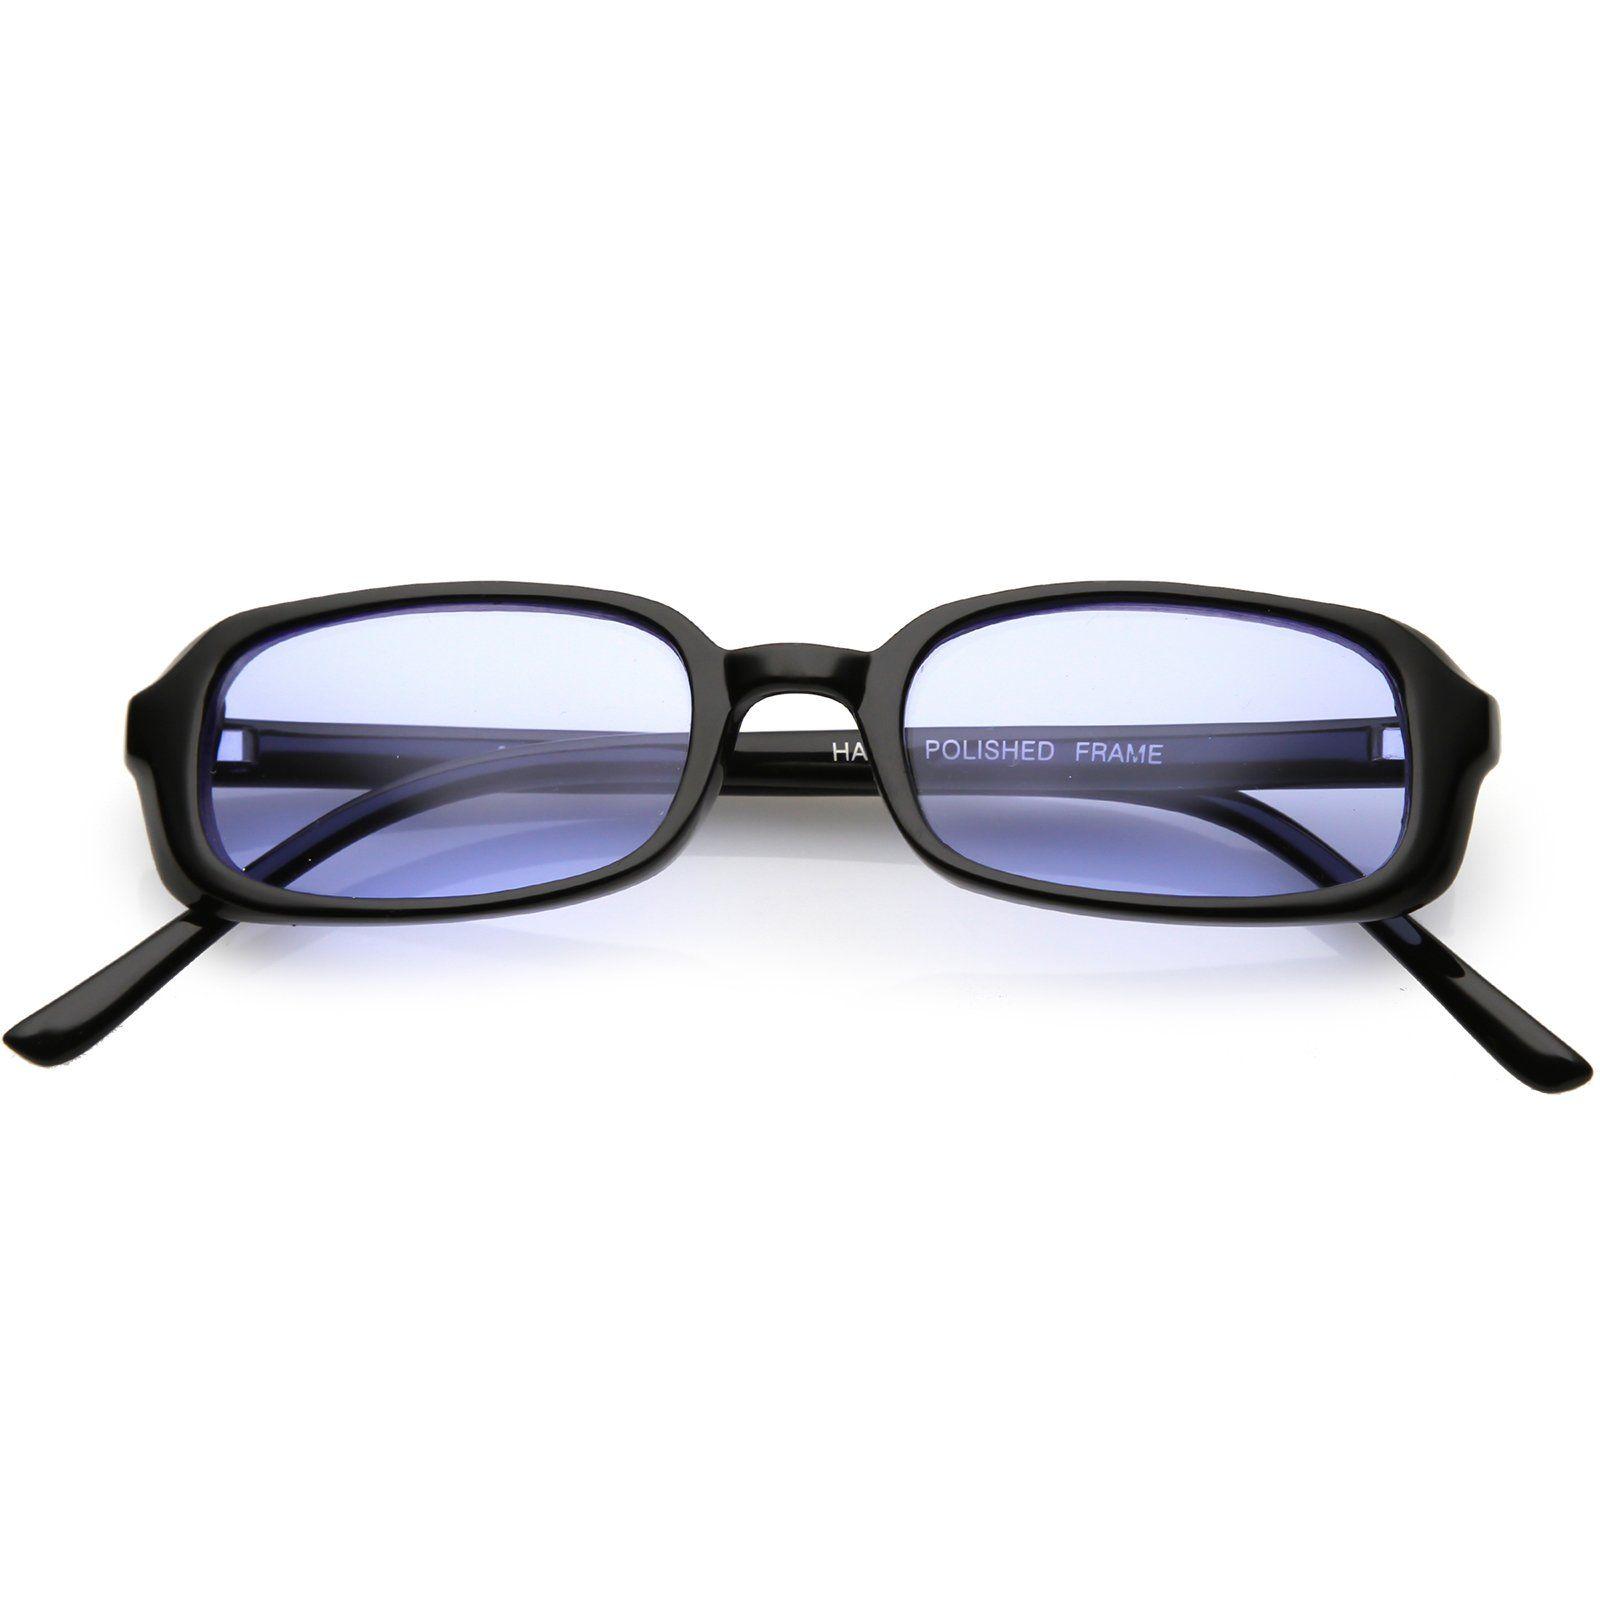 74ac314b3 True Vintage Small Frame Rectangle Sunglasses Color Tinted Lens 46mm # sunglass #sunglasses #frame #clear #purple #bold #summer #oversized  #sunglassla # ...